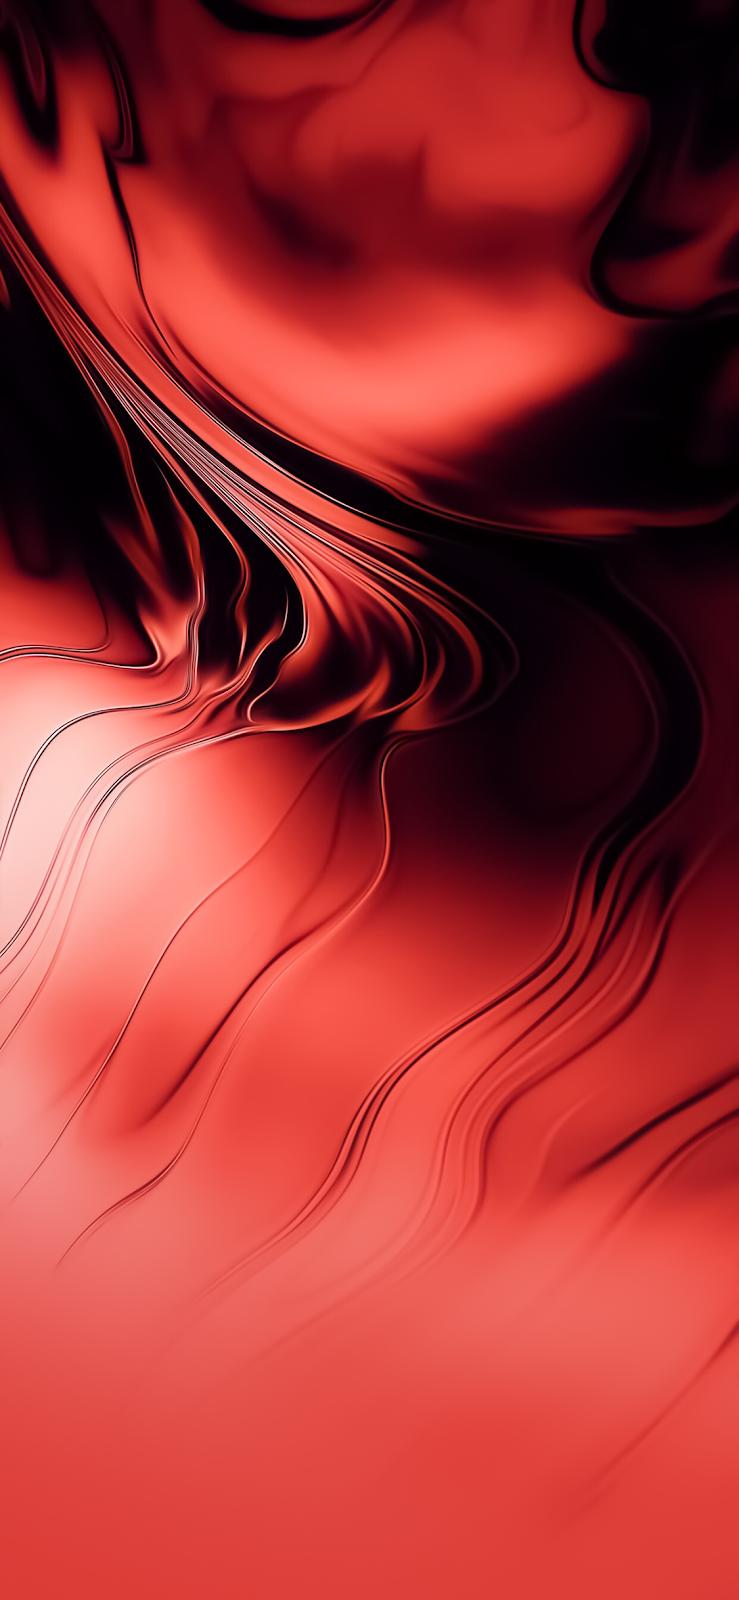 iOS 13 concept by AR72014 ios13wallpaper iOS 13 concept by 739x1600